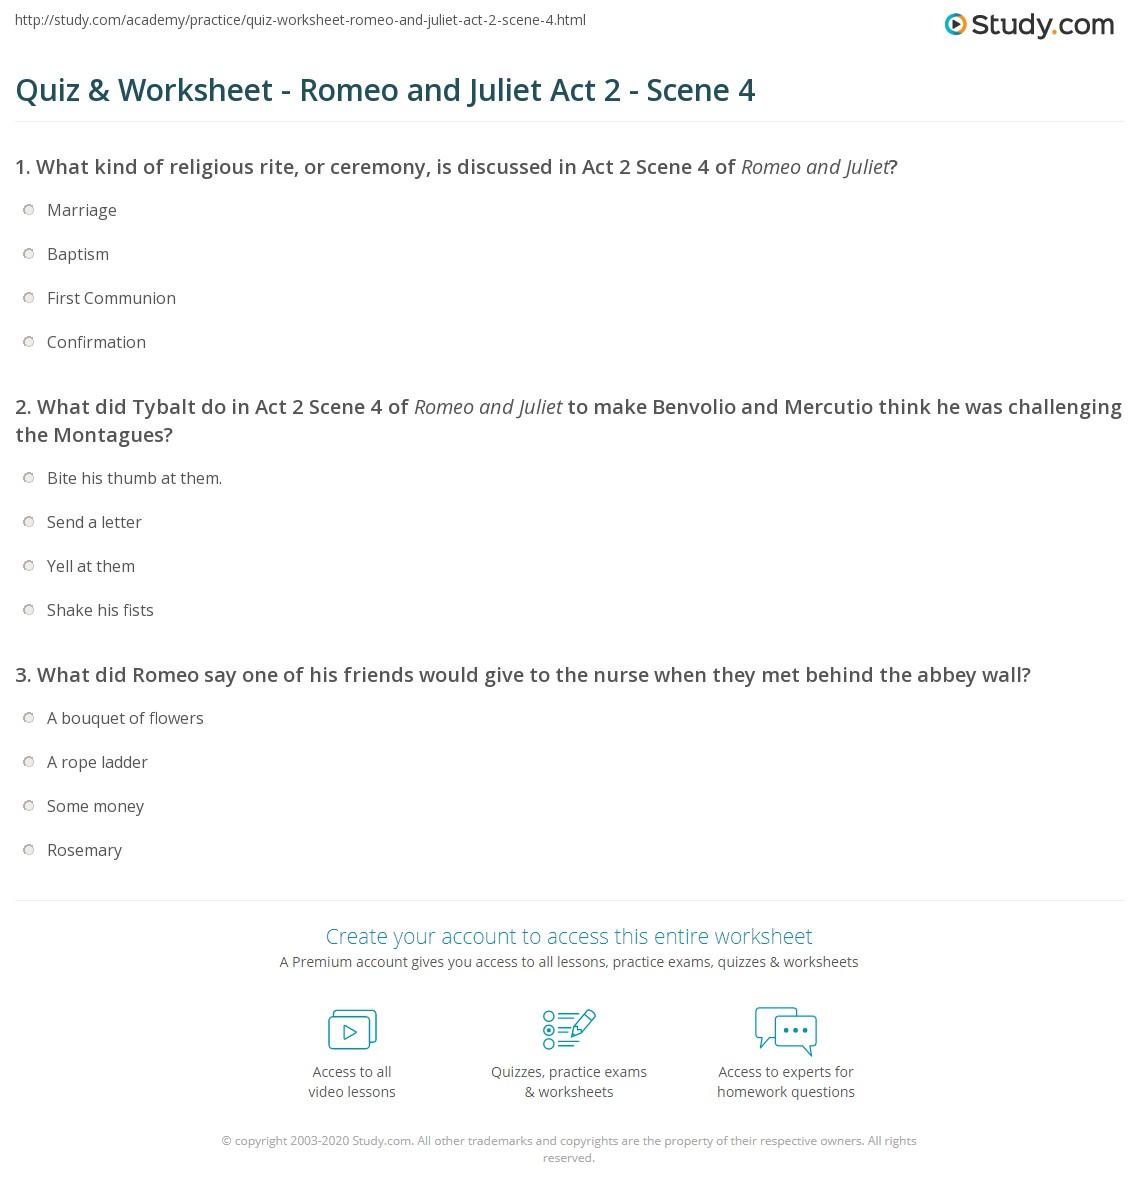 Quiz & Worksheet - Romeo and Juliet Act 2 - Scene 4 | Study com